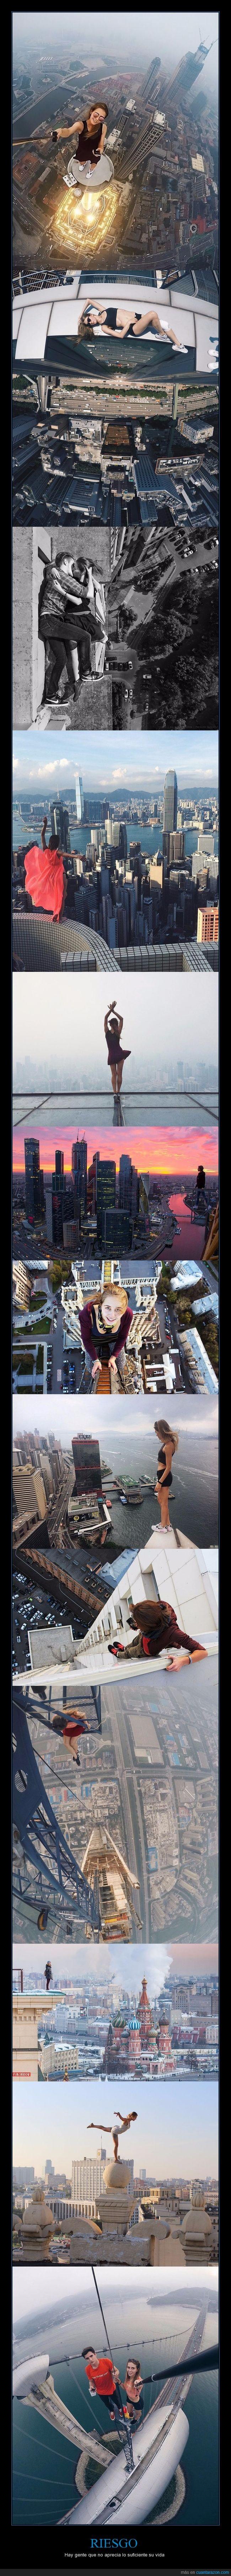 fotos,riesgo,rusa,selfies